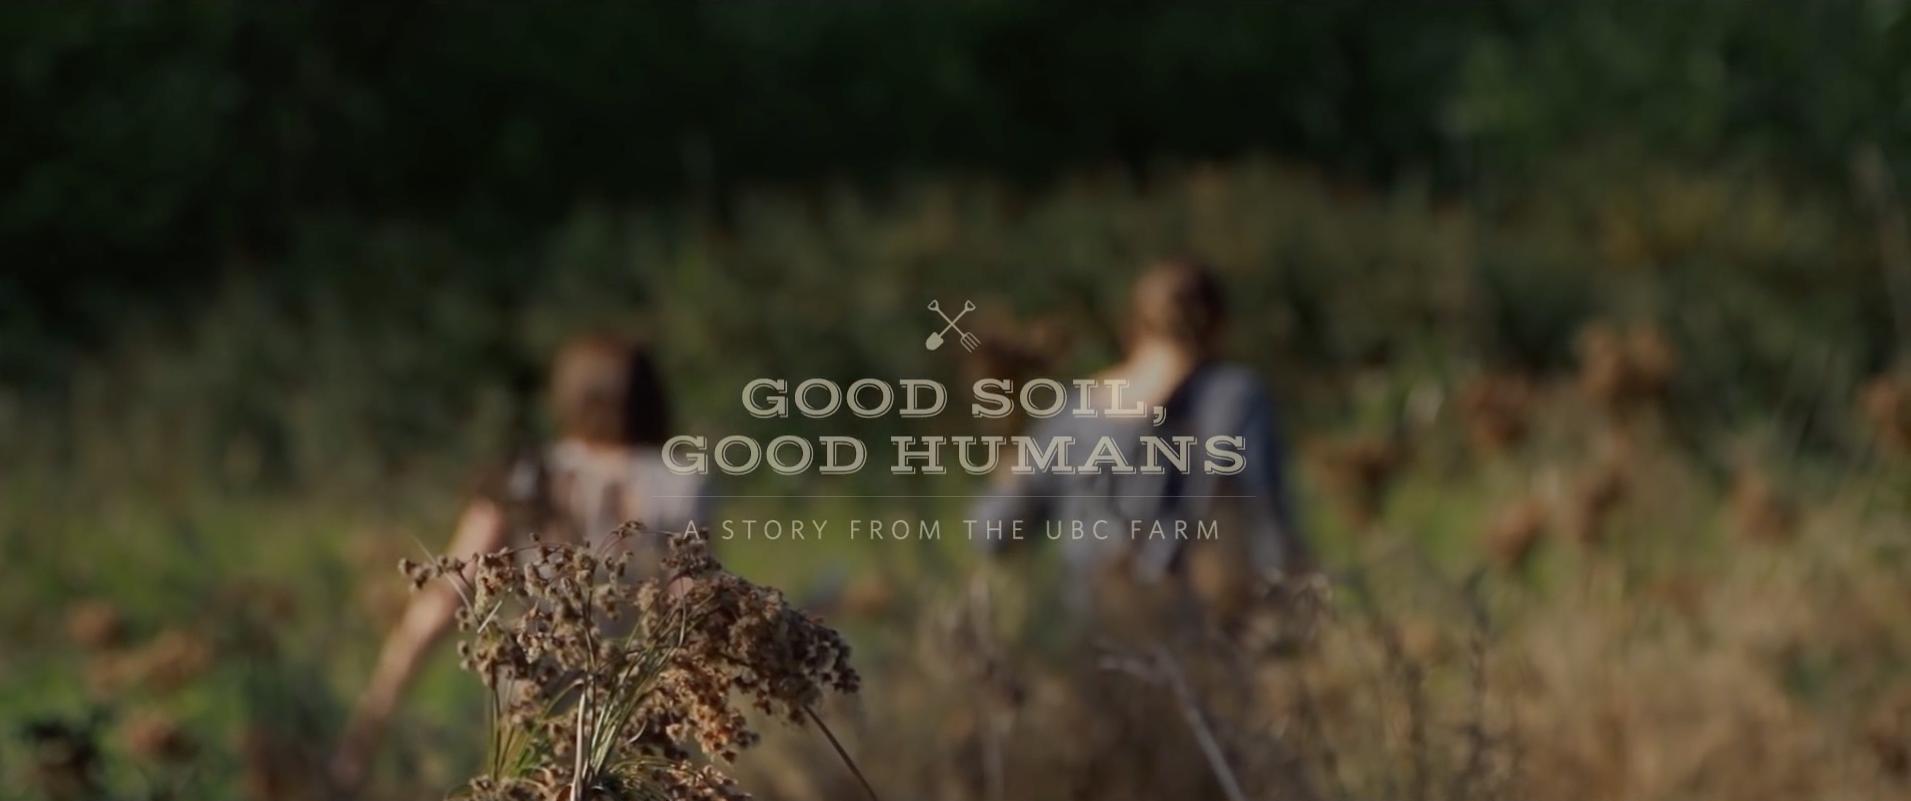 Copy of Good Soil, Good Humans